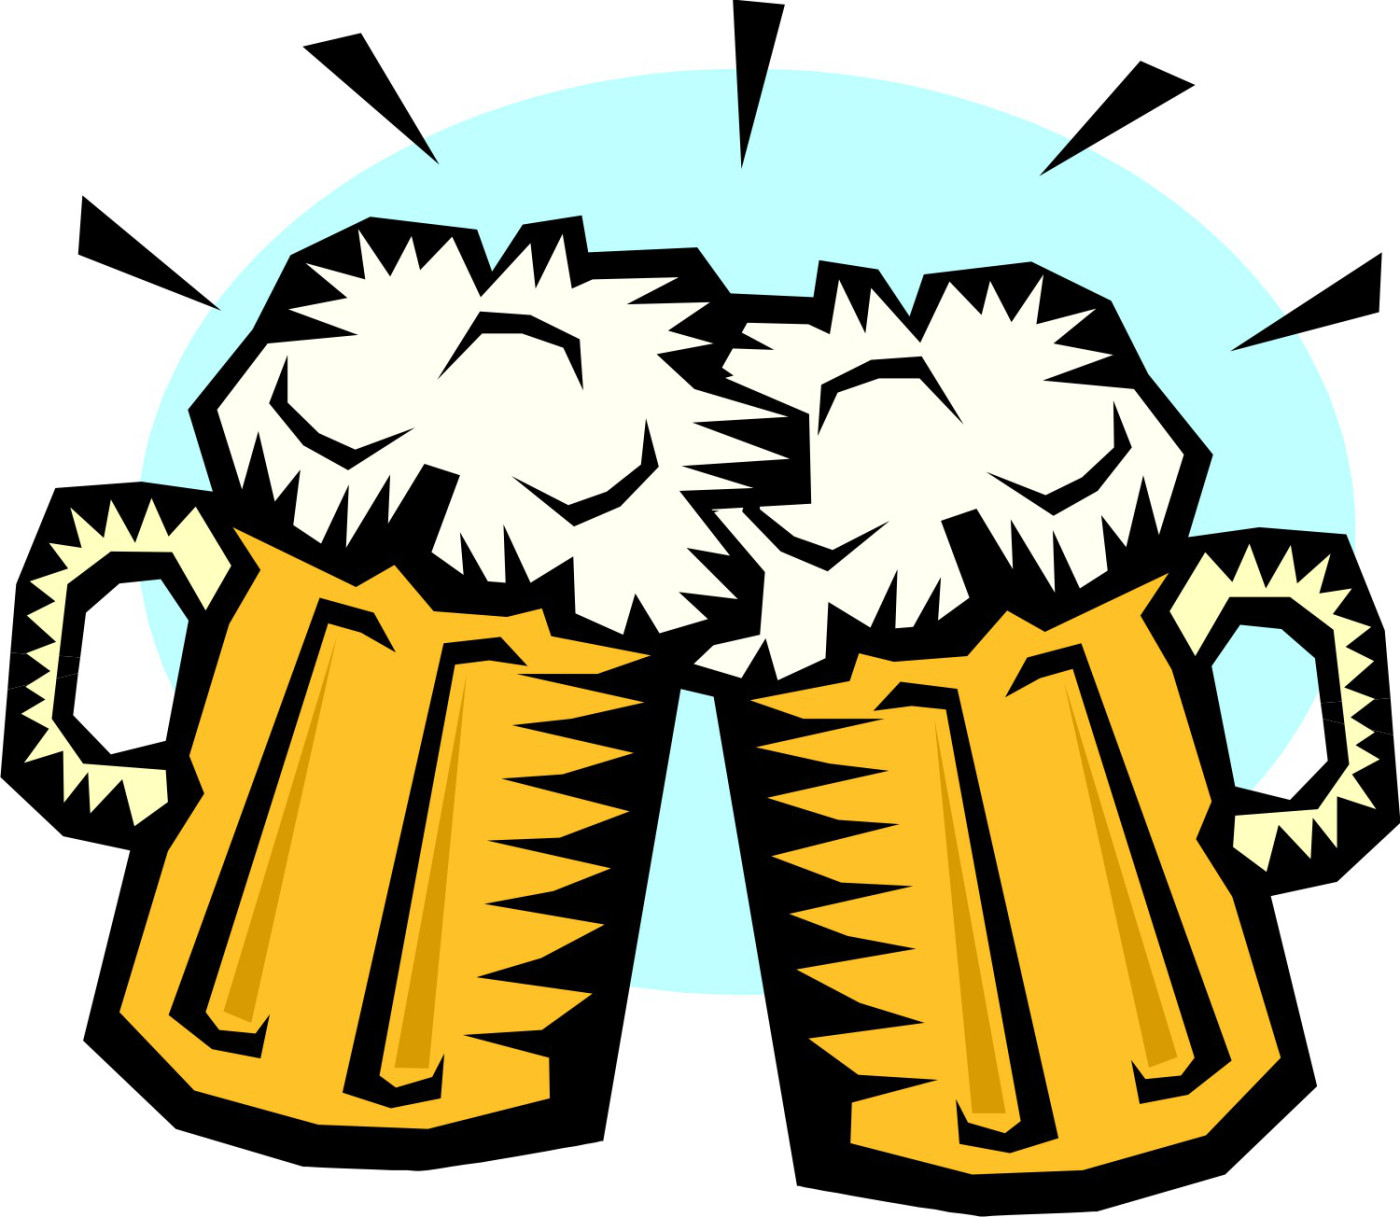 Bar clipart alcohol. Pub crawl mosquito hostel